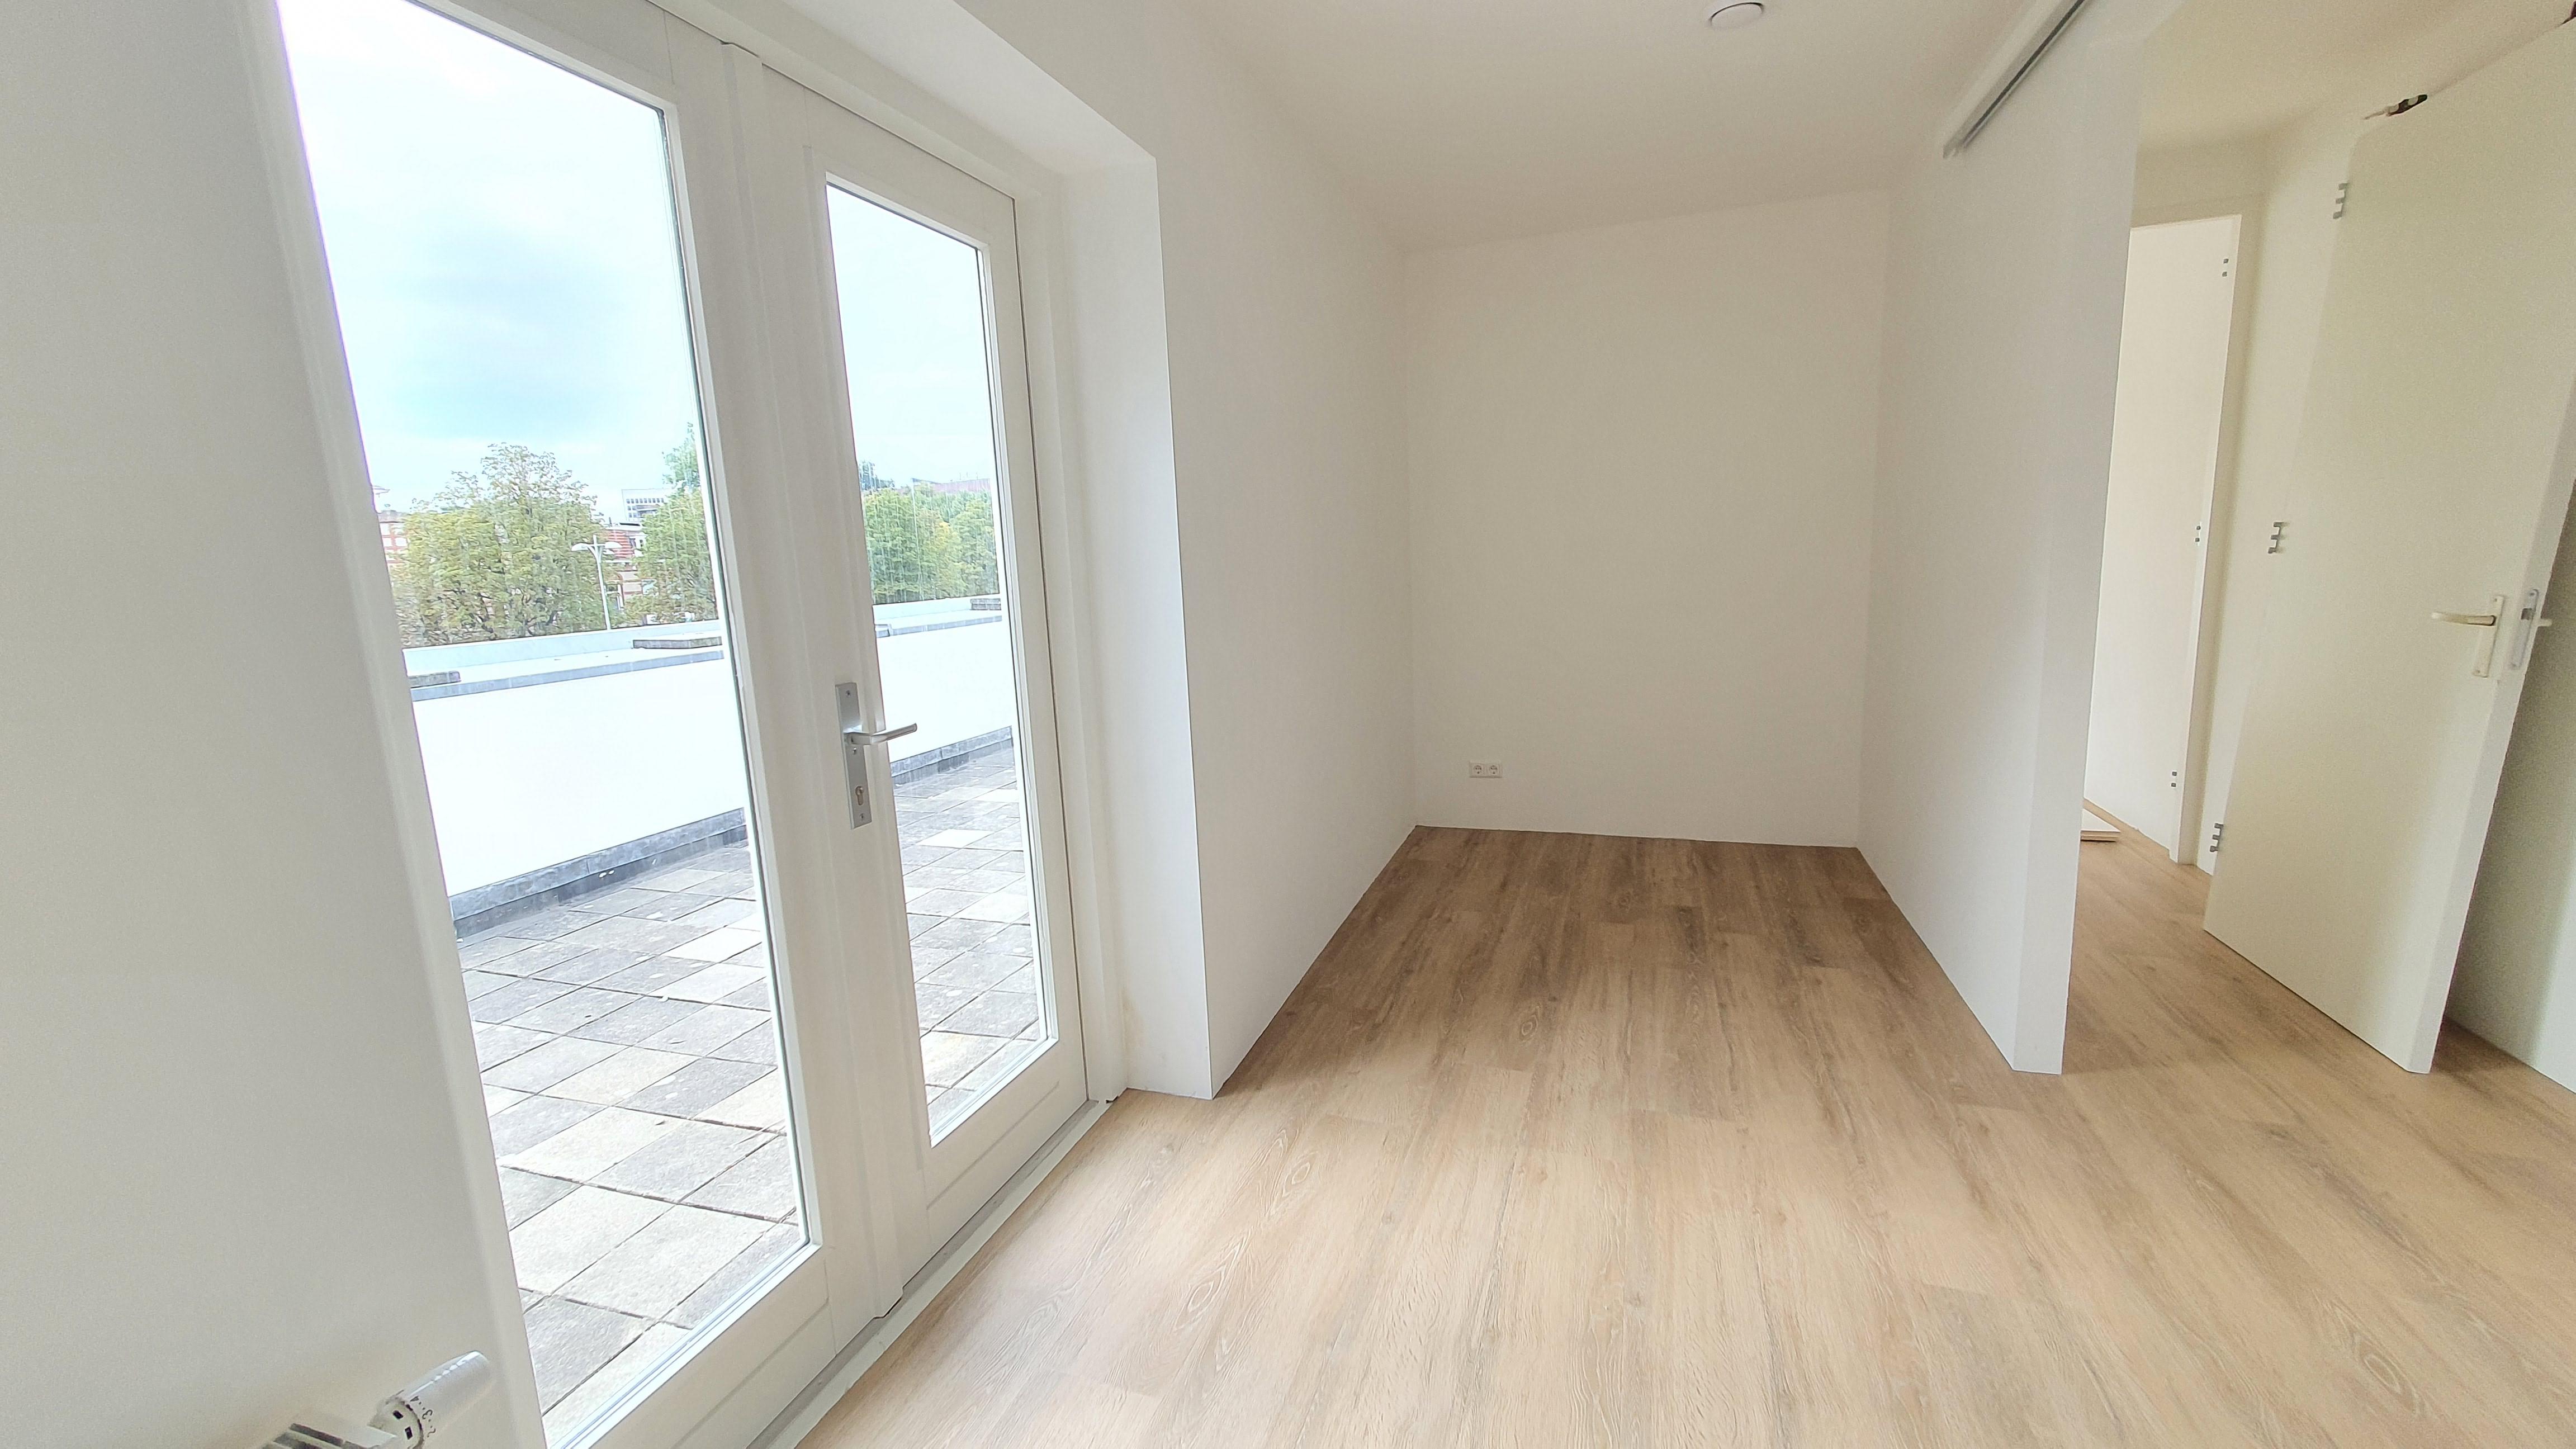 Te huur: Appartement Achter de Arnhemse Poortwal, Amersfoort - 13